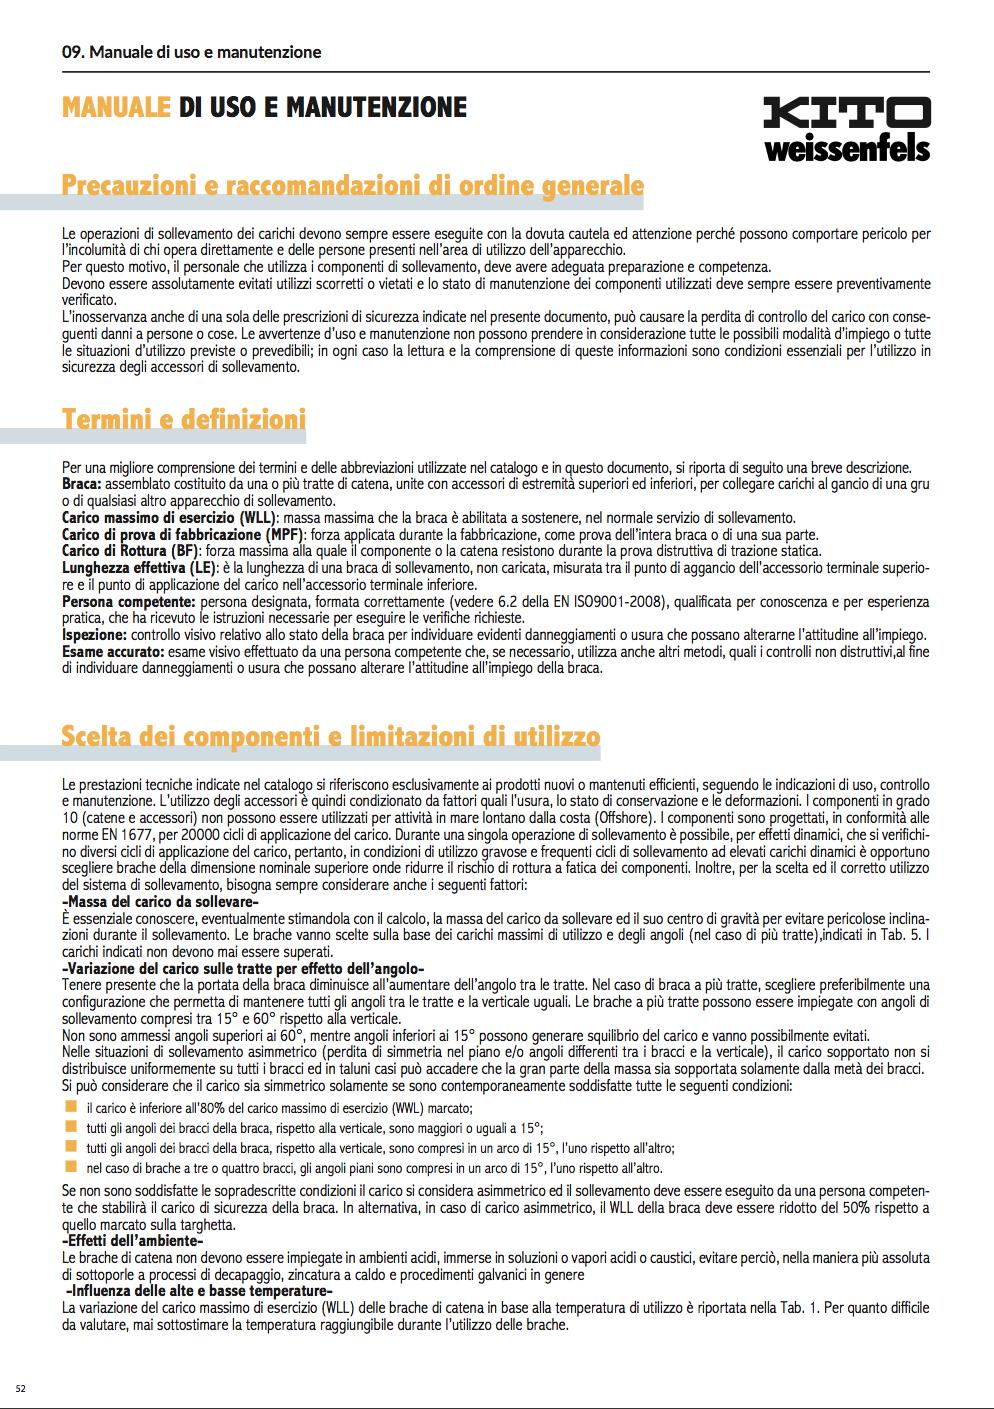 Manuale-uso-pag1